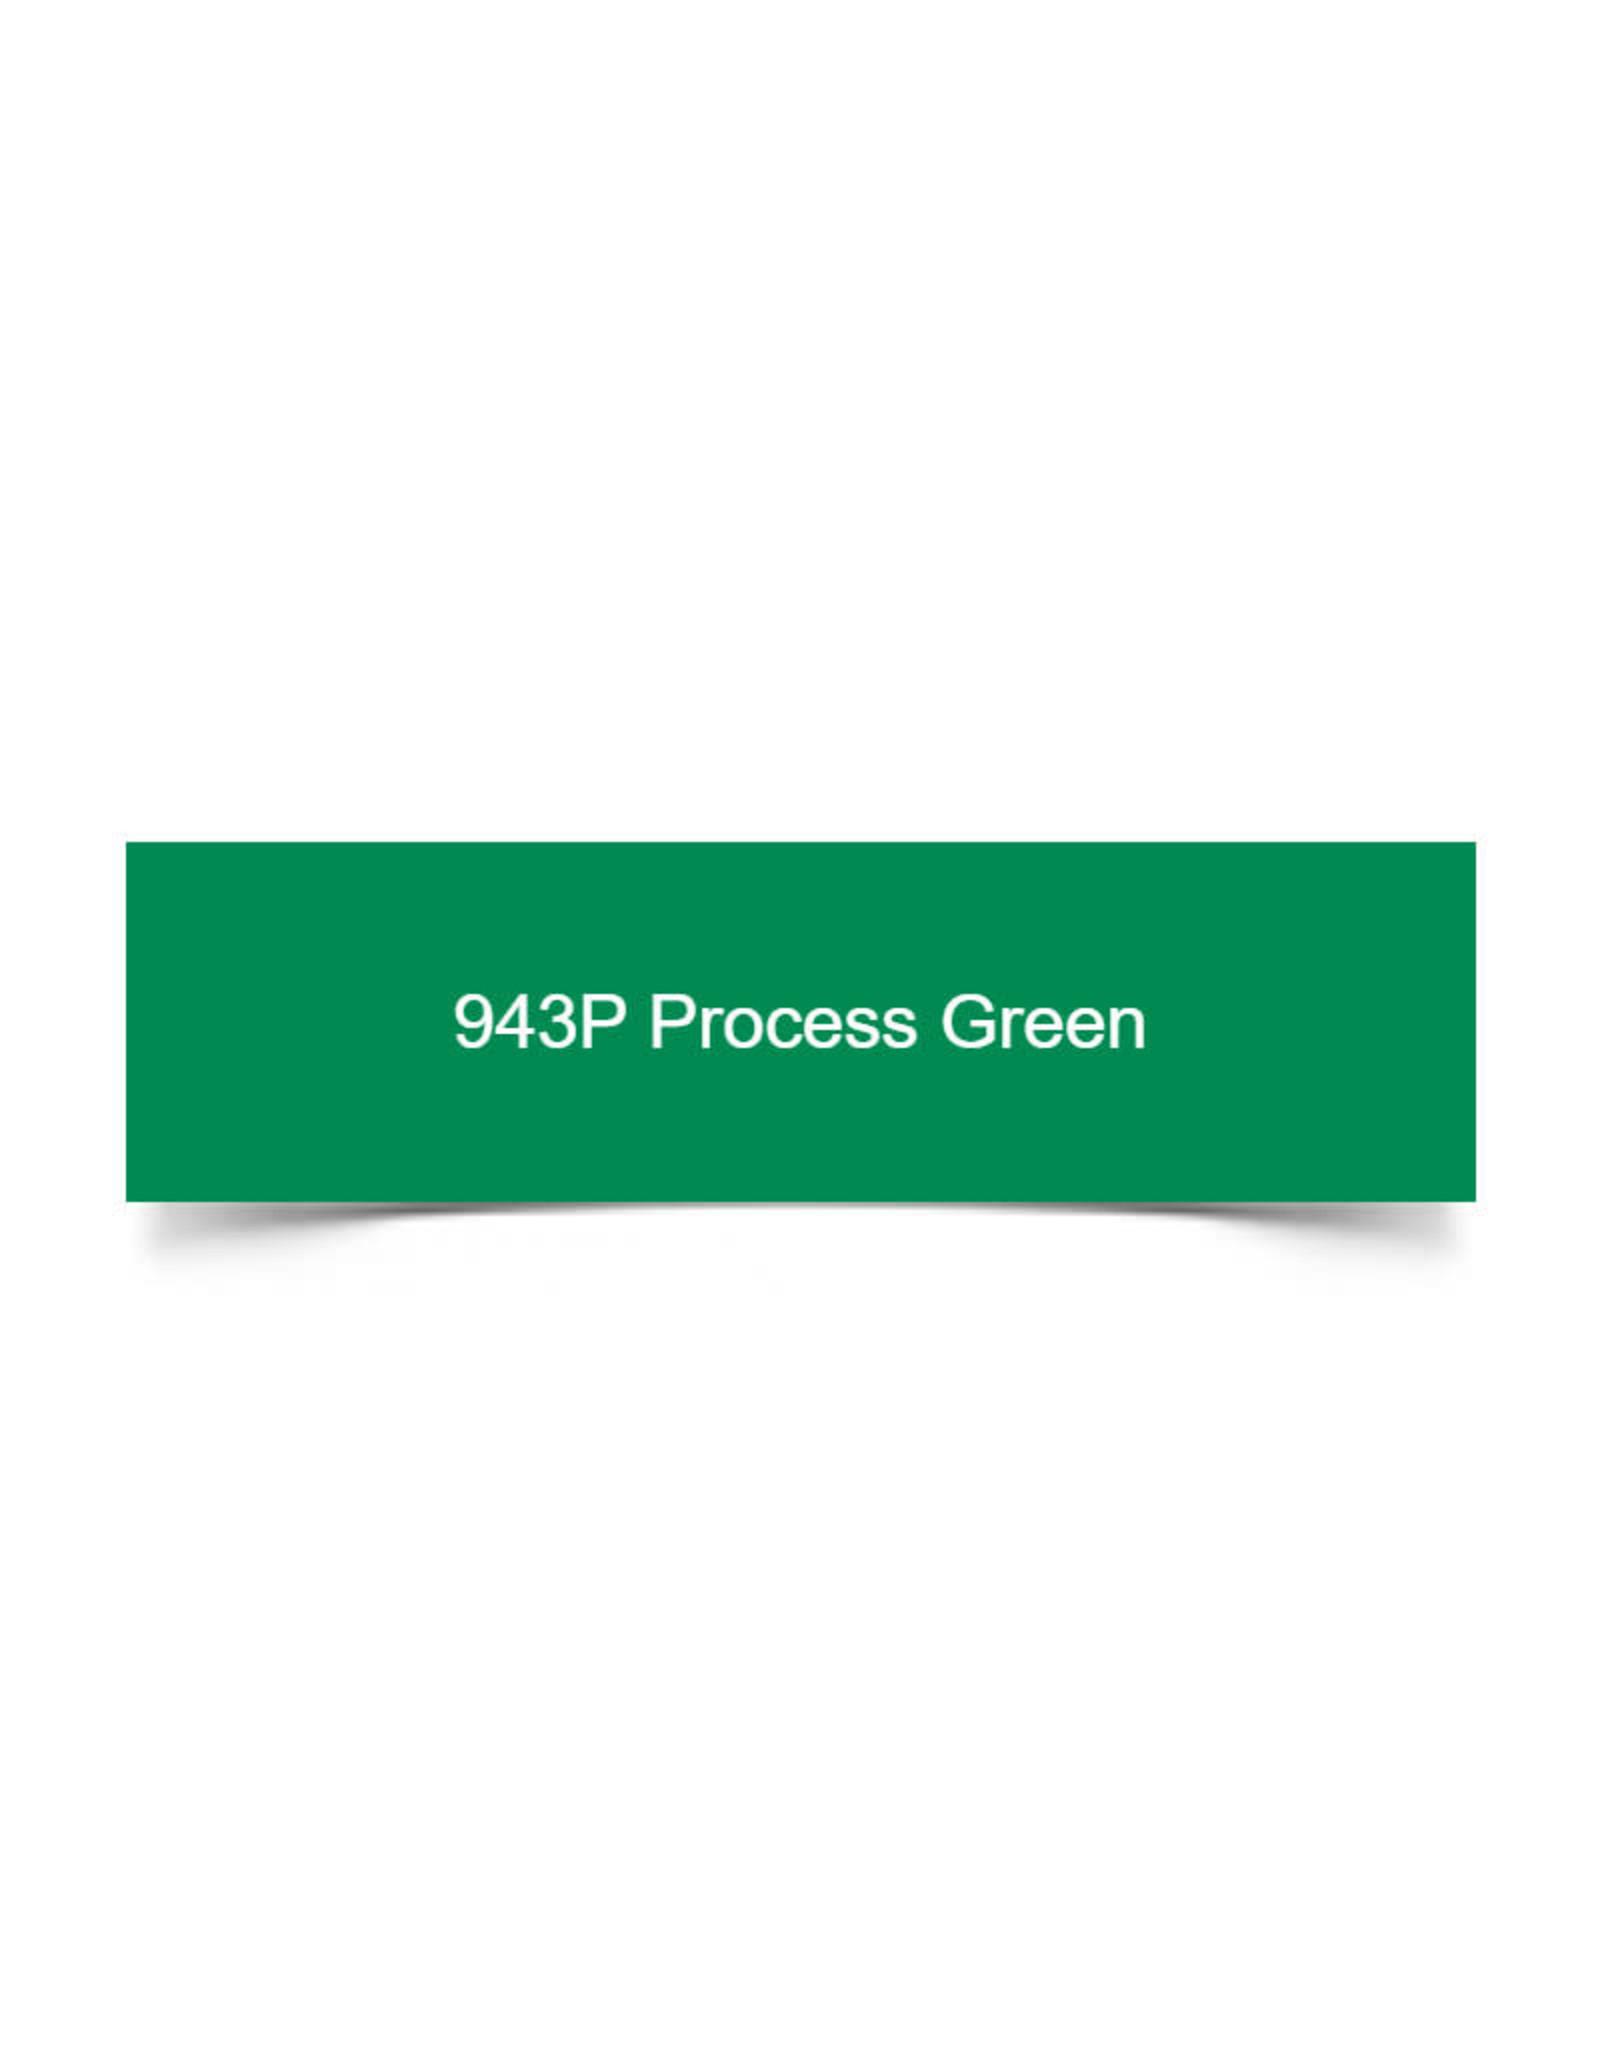 1 Shot 1 Shot Pearlescent Enamels 237 ml - 943P Process Green